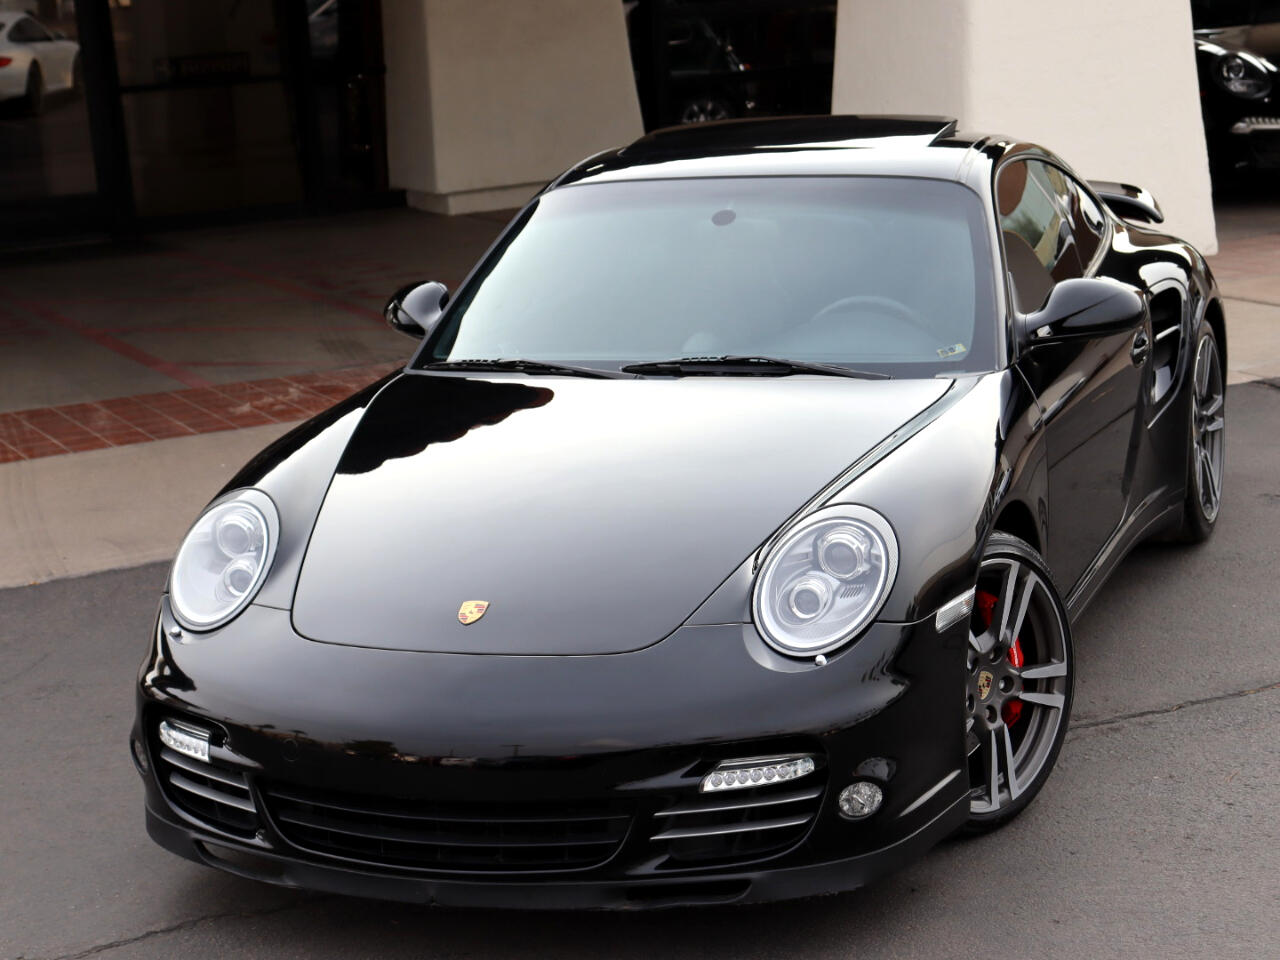 Porsche 911 Turbo Coupe 2010